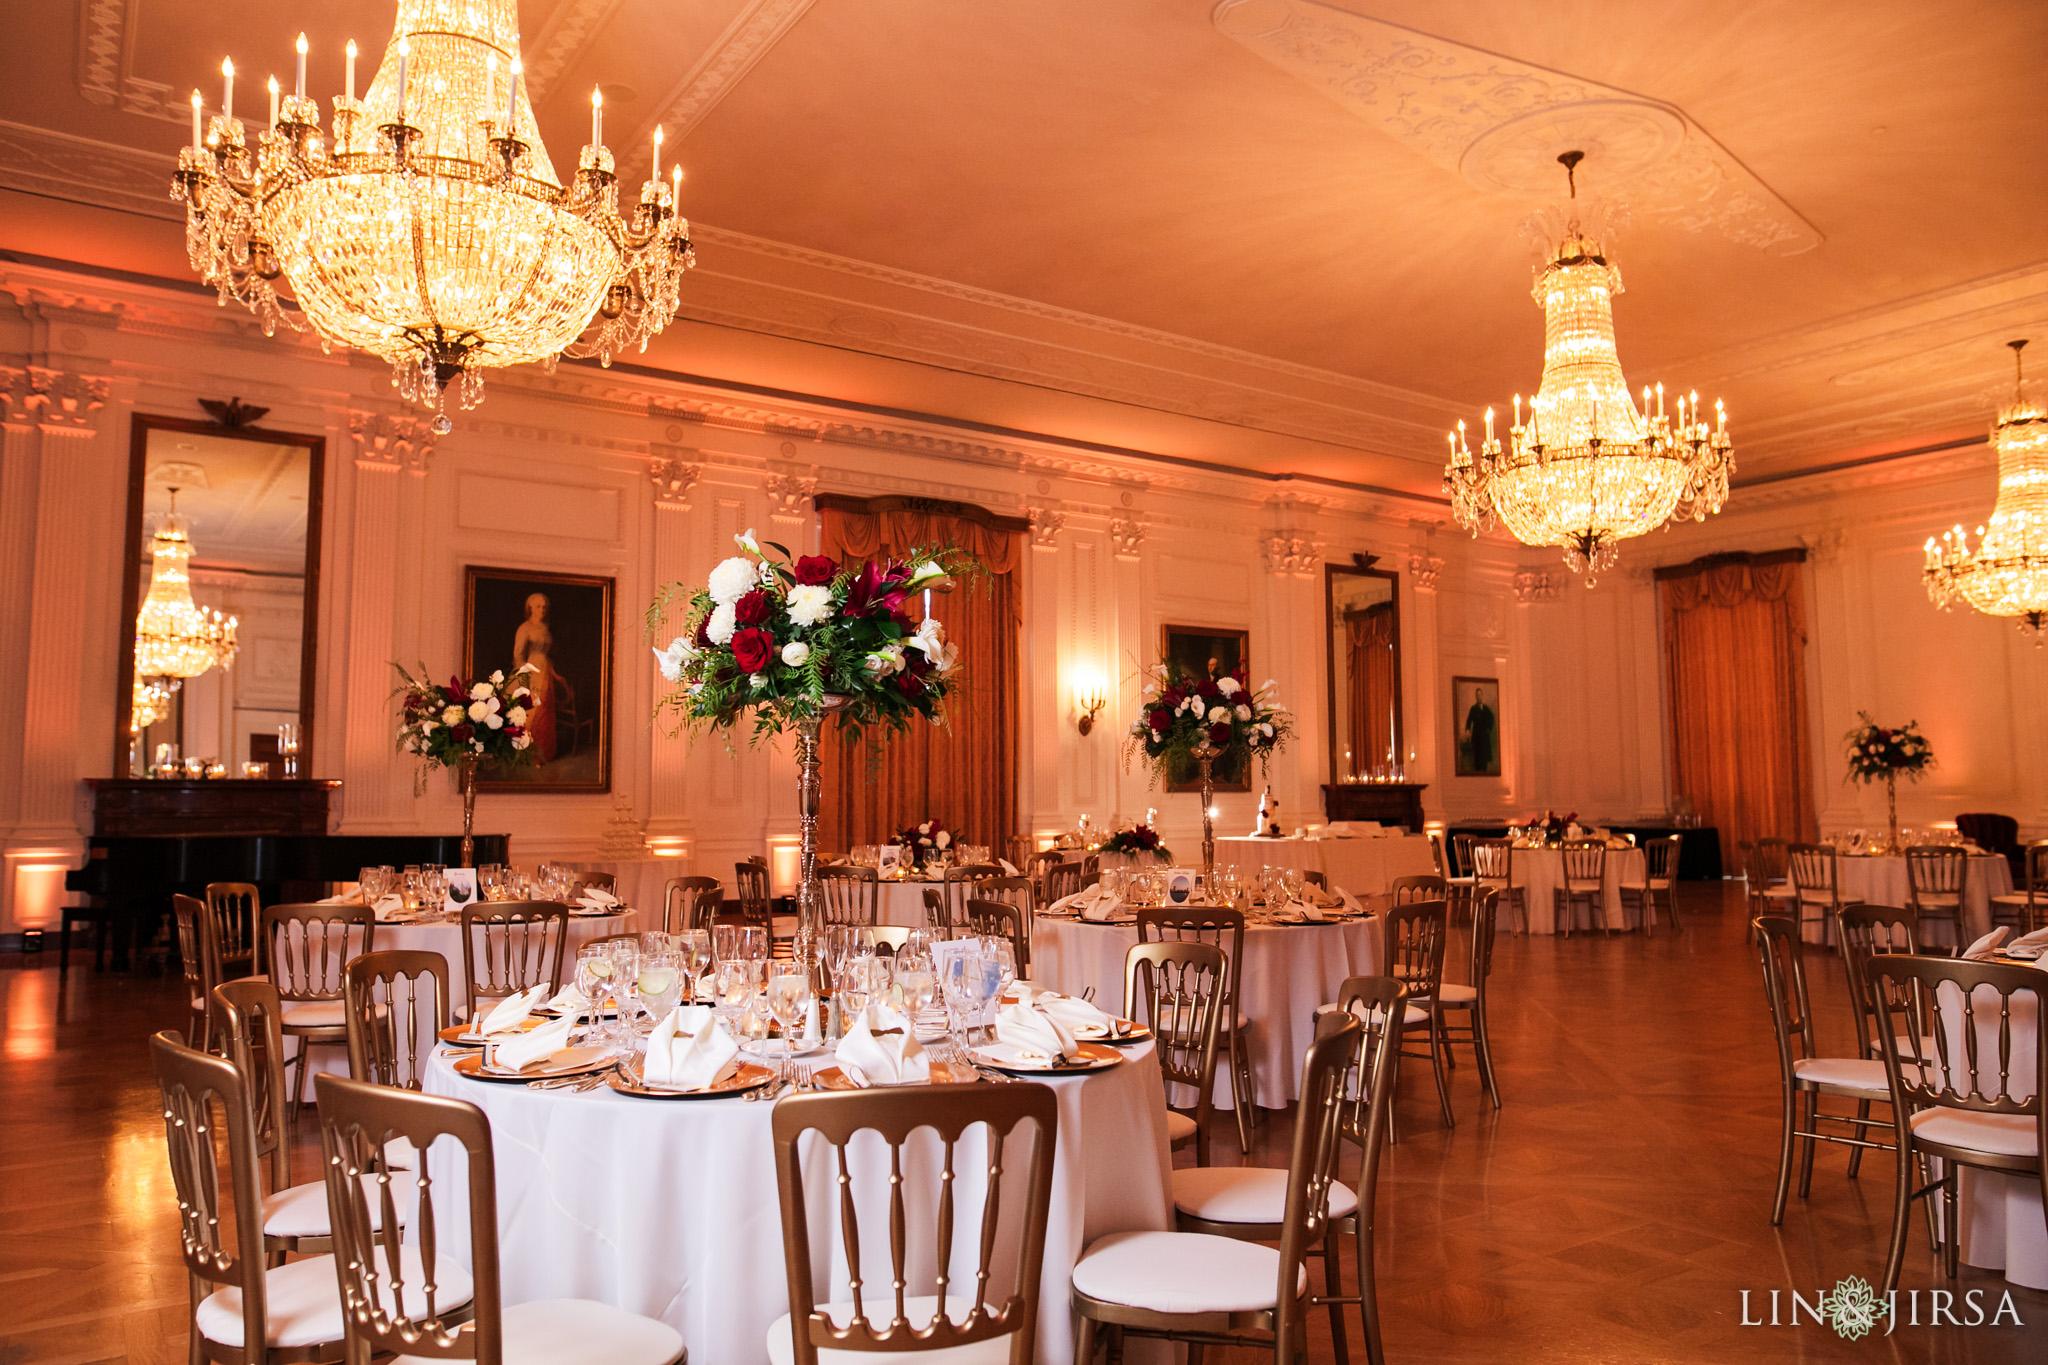 023 richard nixon library wedding reception photography 1